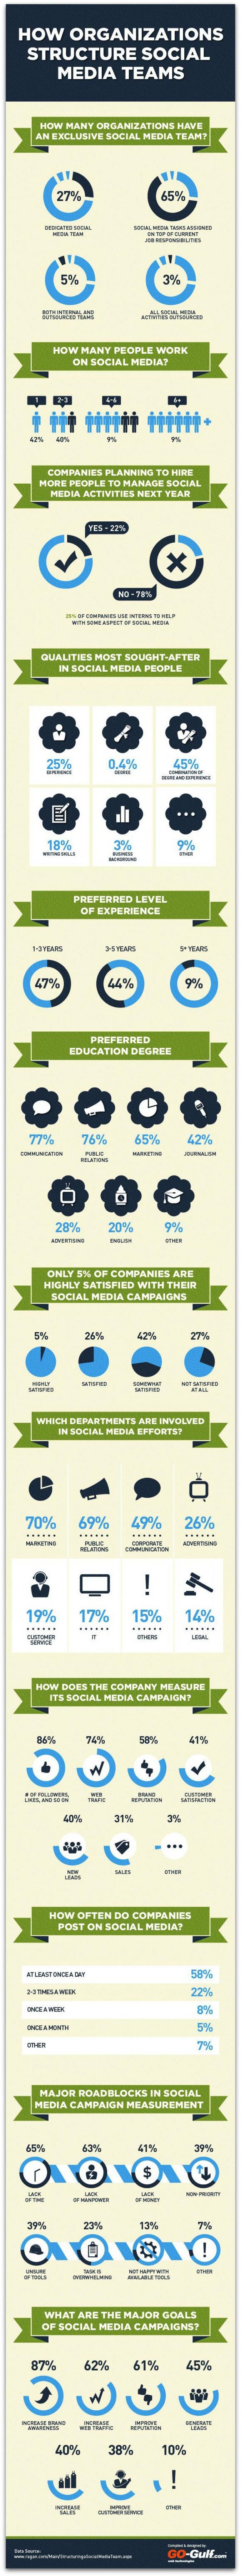 infografik social media im unternehmen